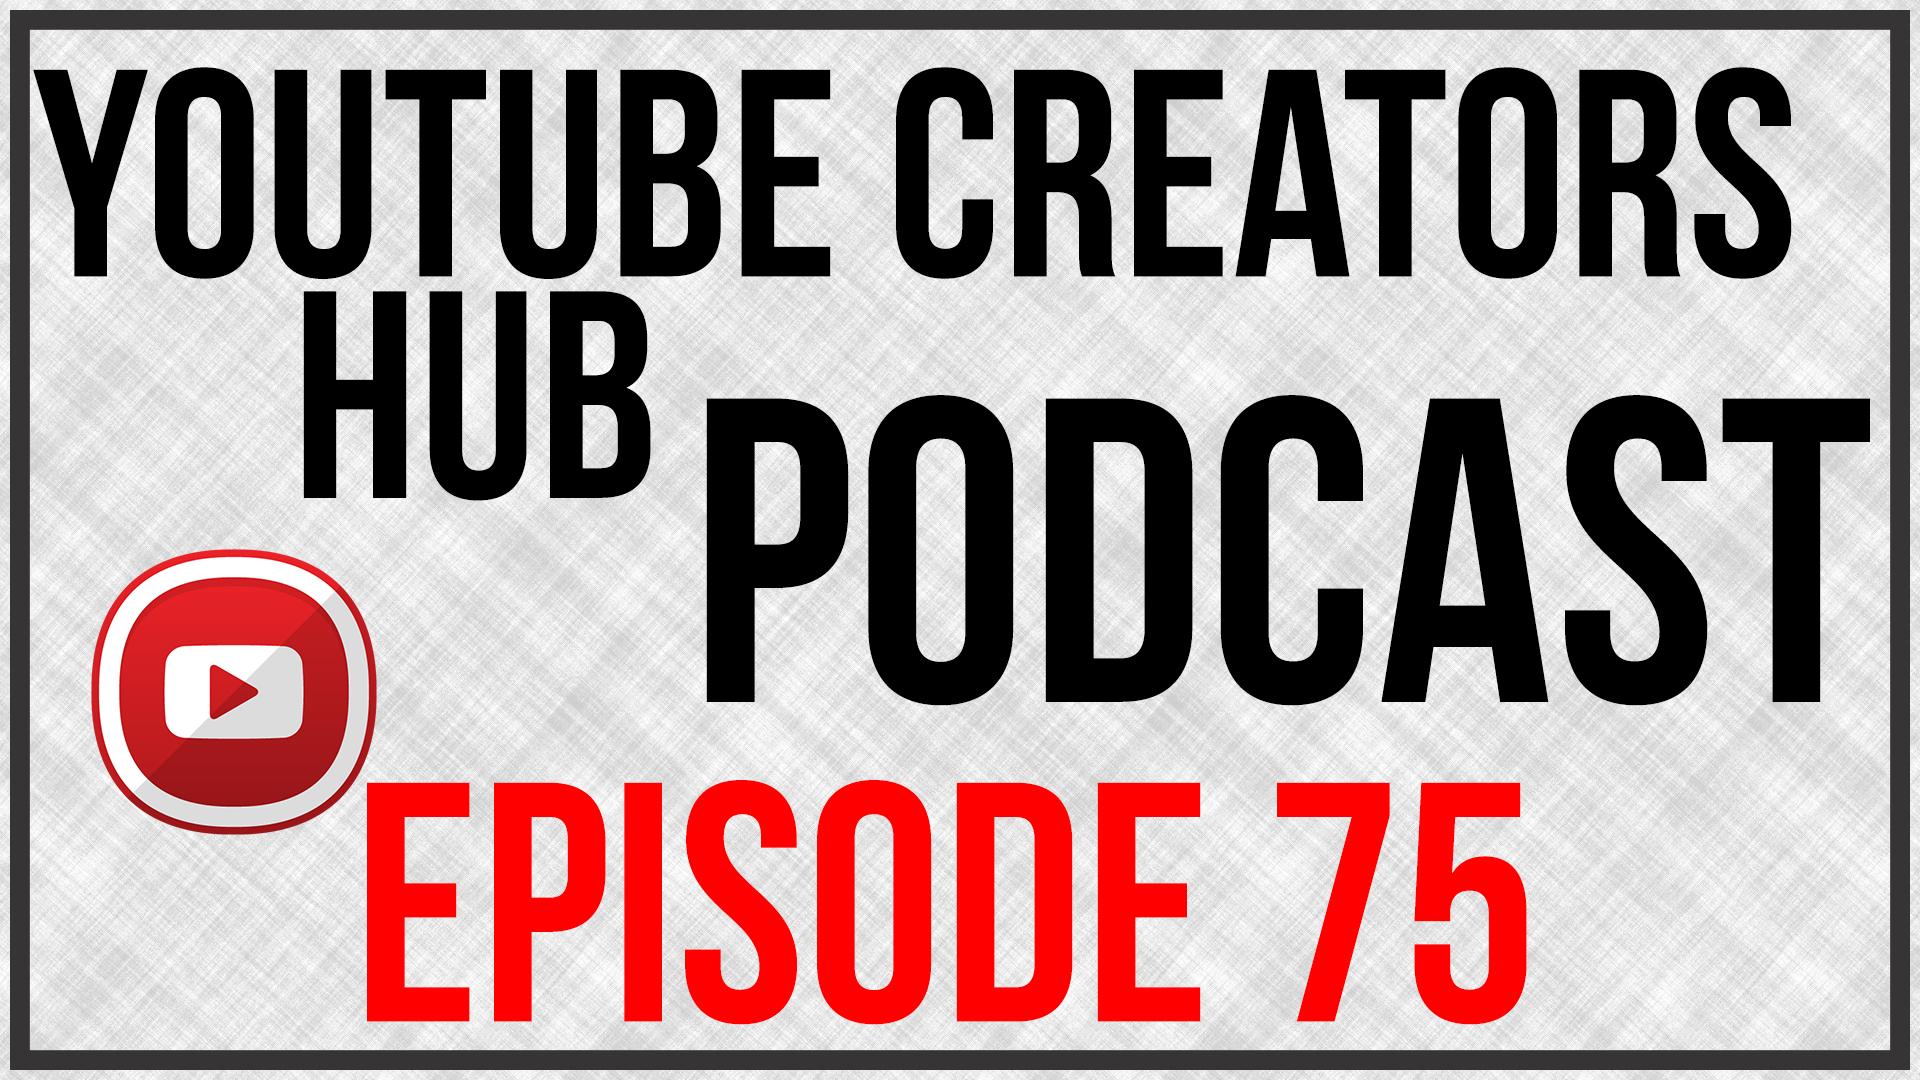 YouTube Creators Hub Podcast Episode 75